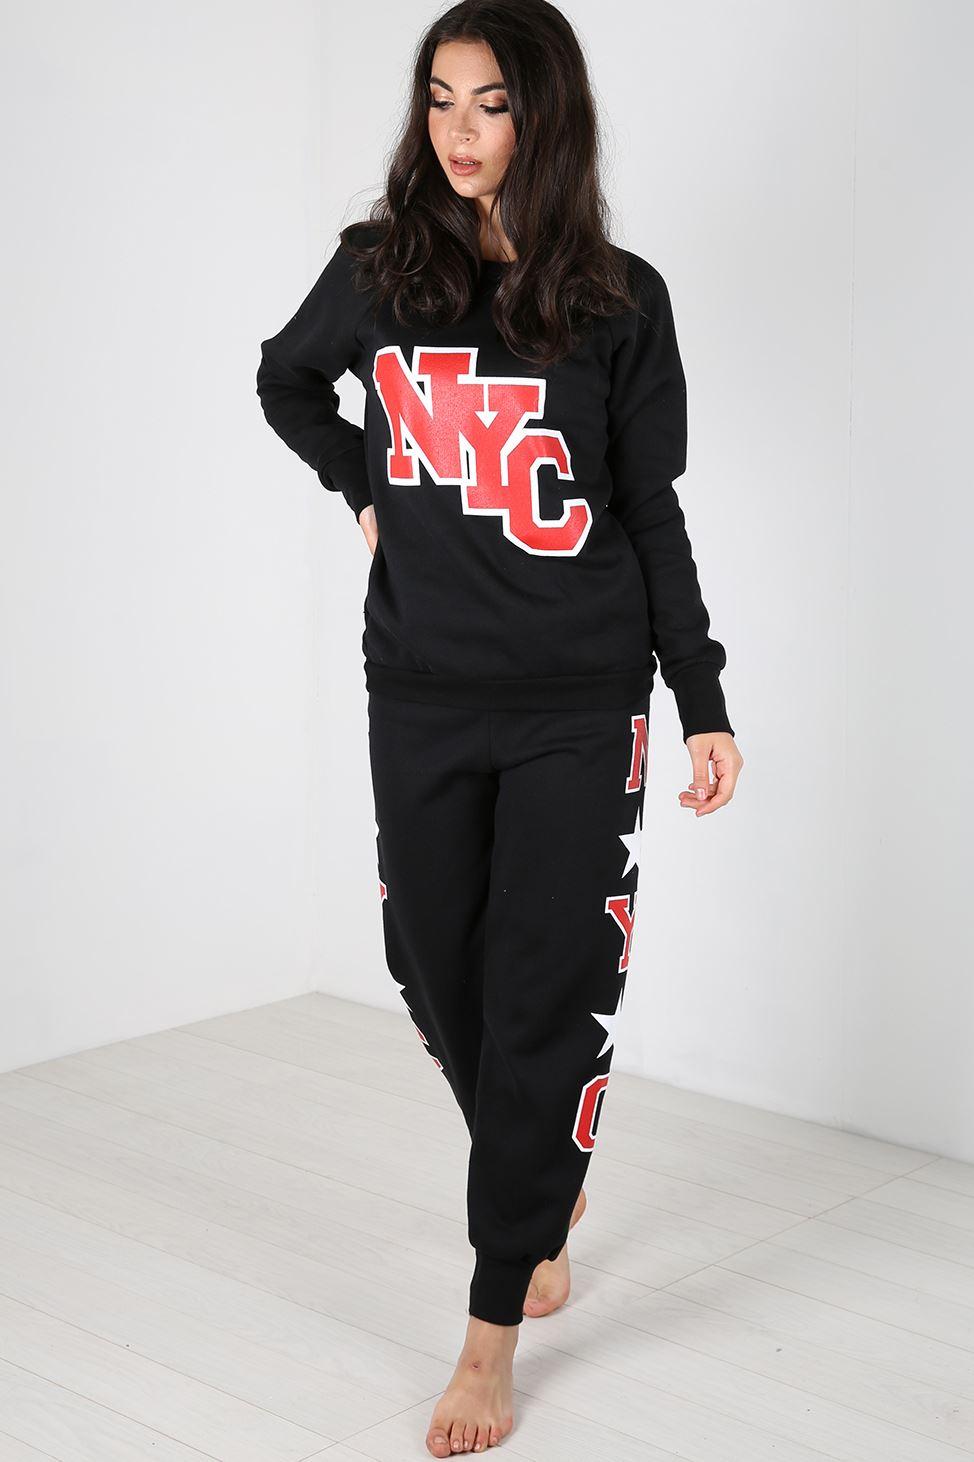 Creative Adidas Womens Ladies 3S Full Tracksuit Set Hoodie Top And Jogging Bottoms Pants | EBay